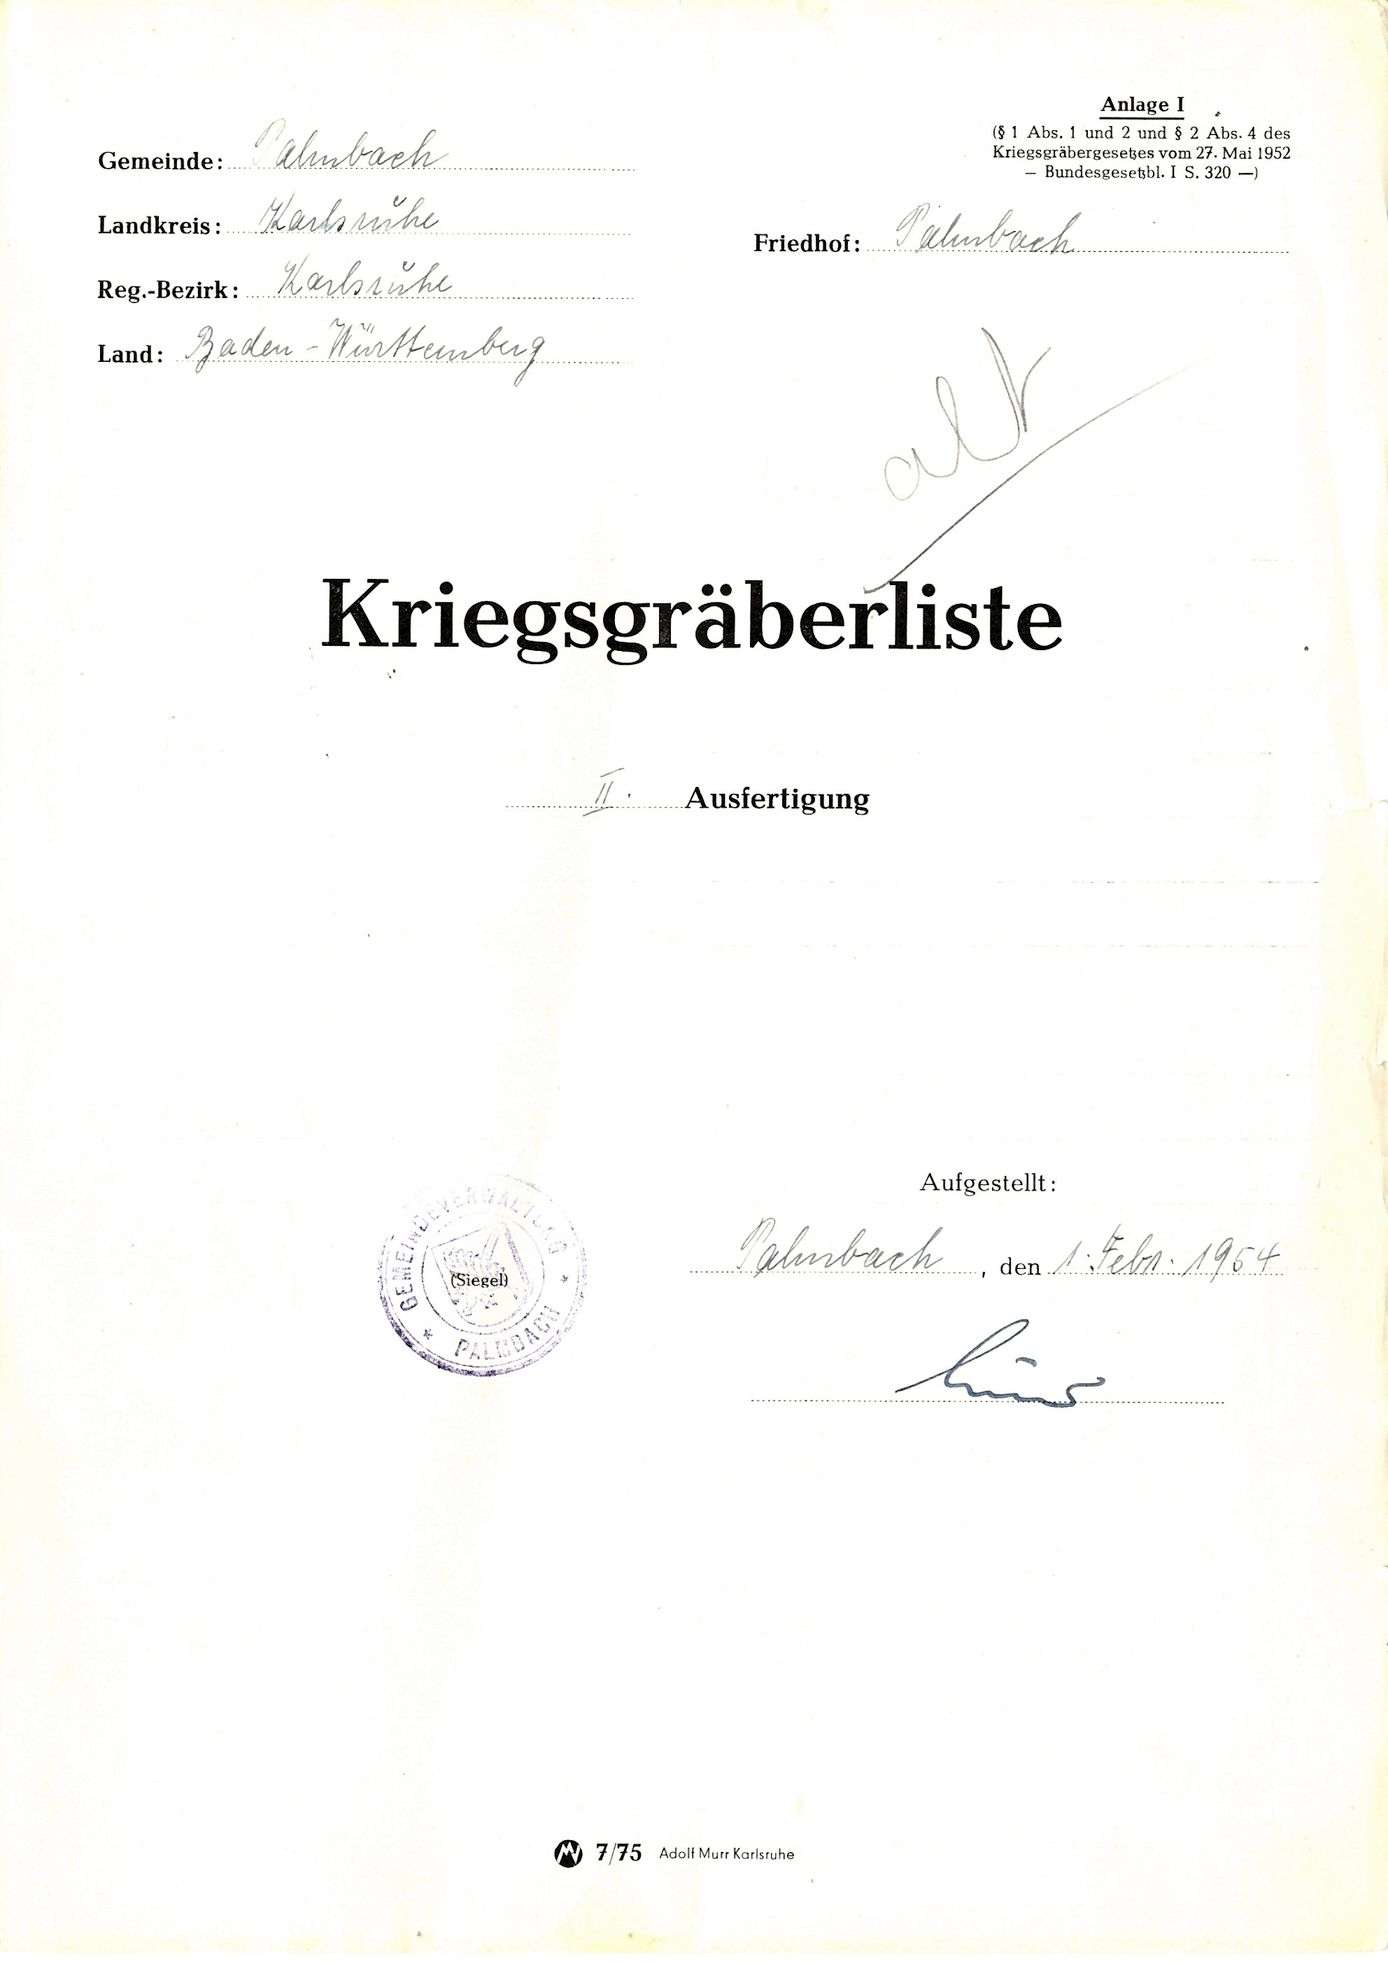 Palmbach, Bild 3